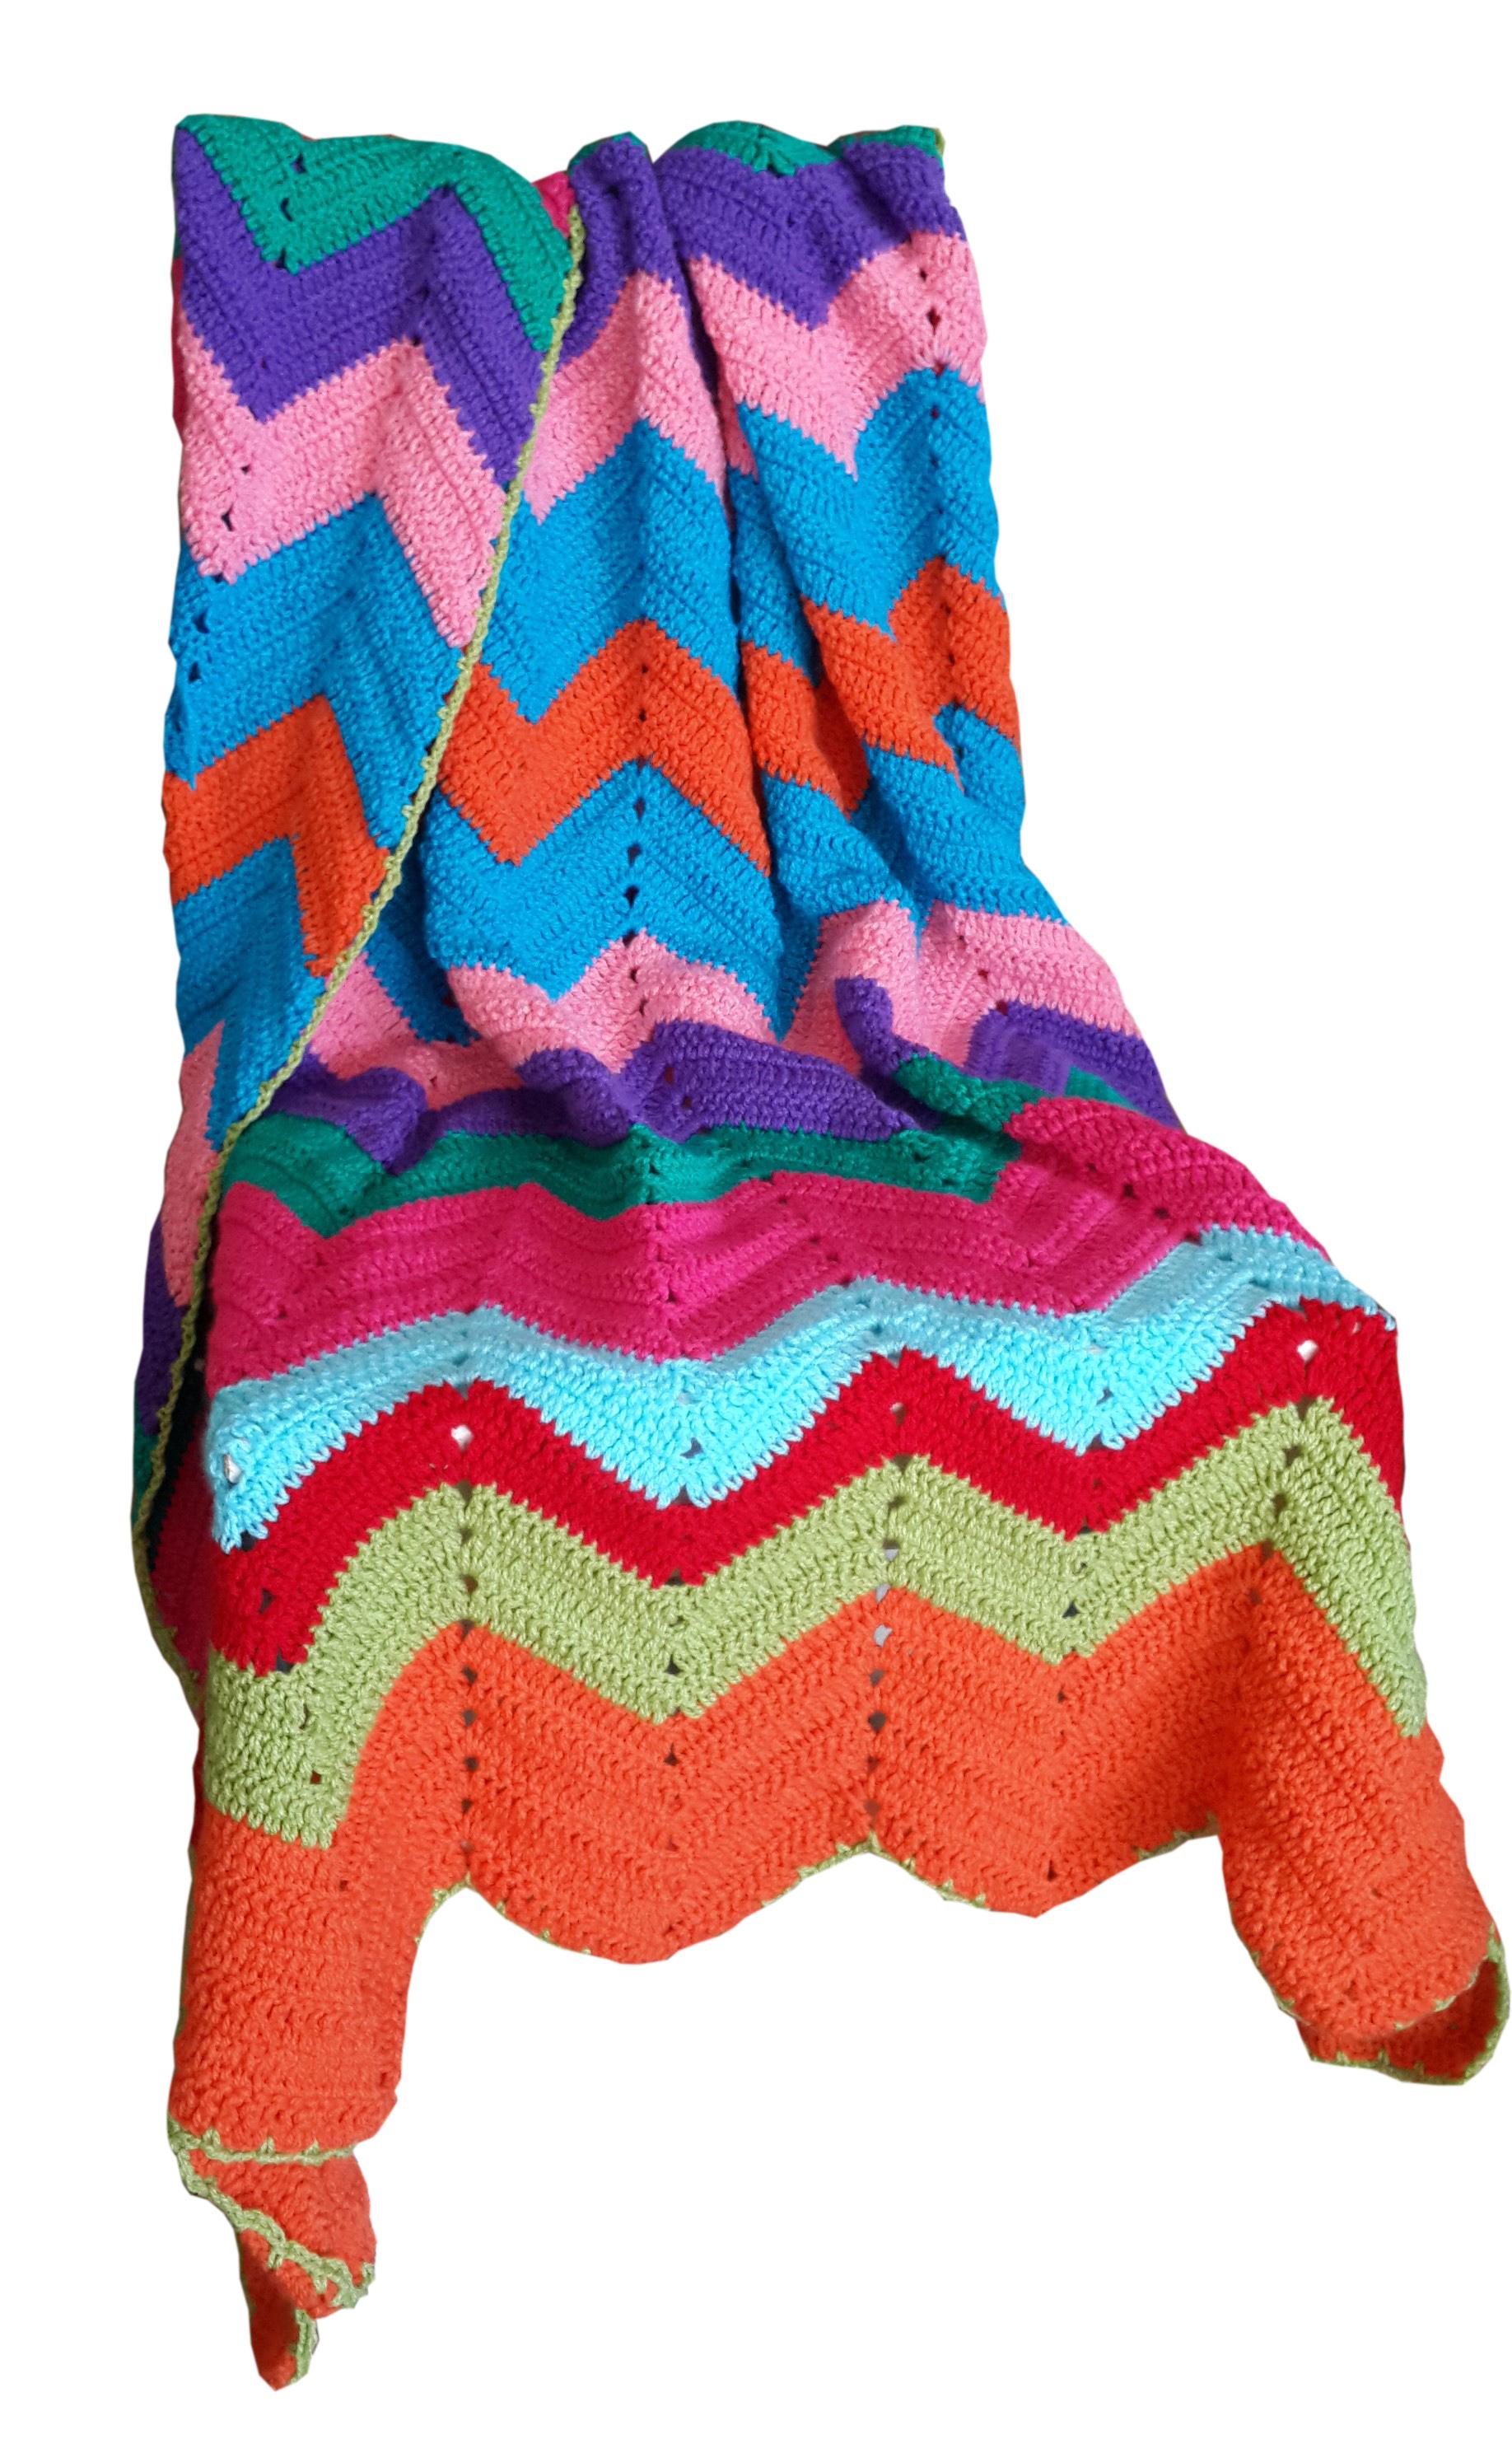 Vintage Look Zig Zag Crochet Blanket In Rainbow 115155cm Moo Chick